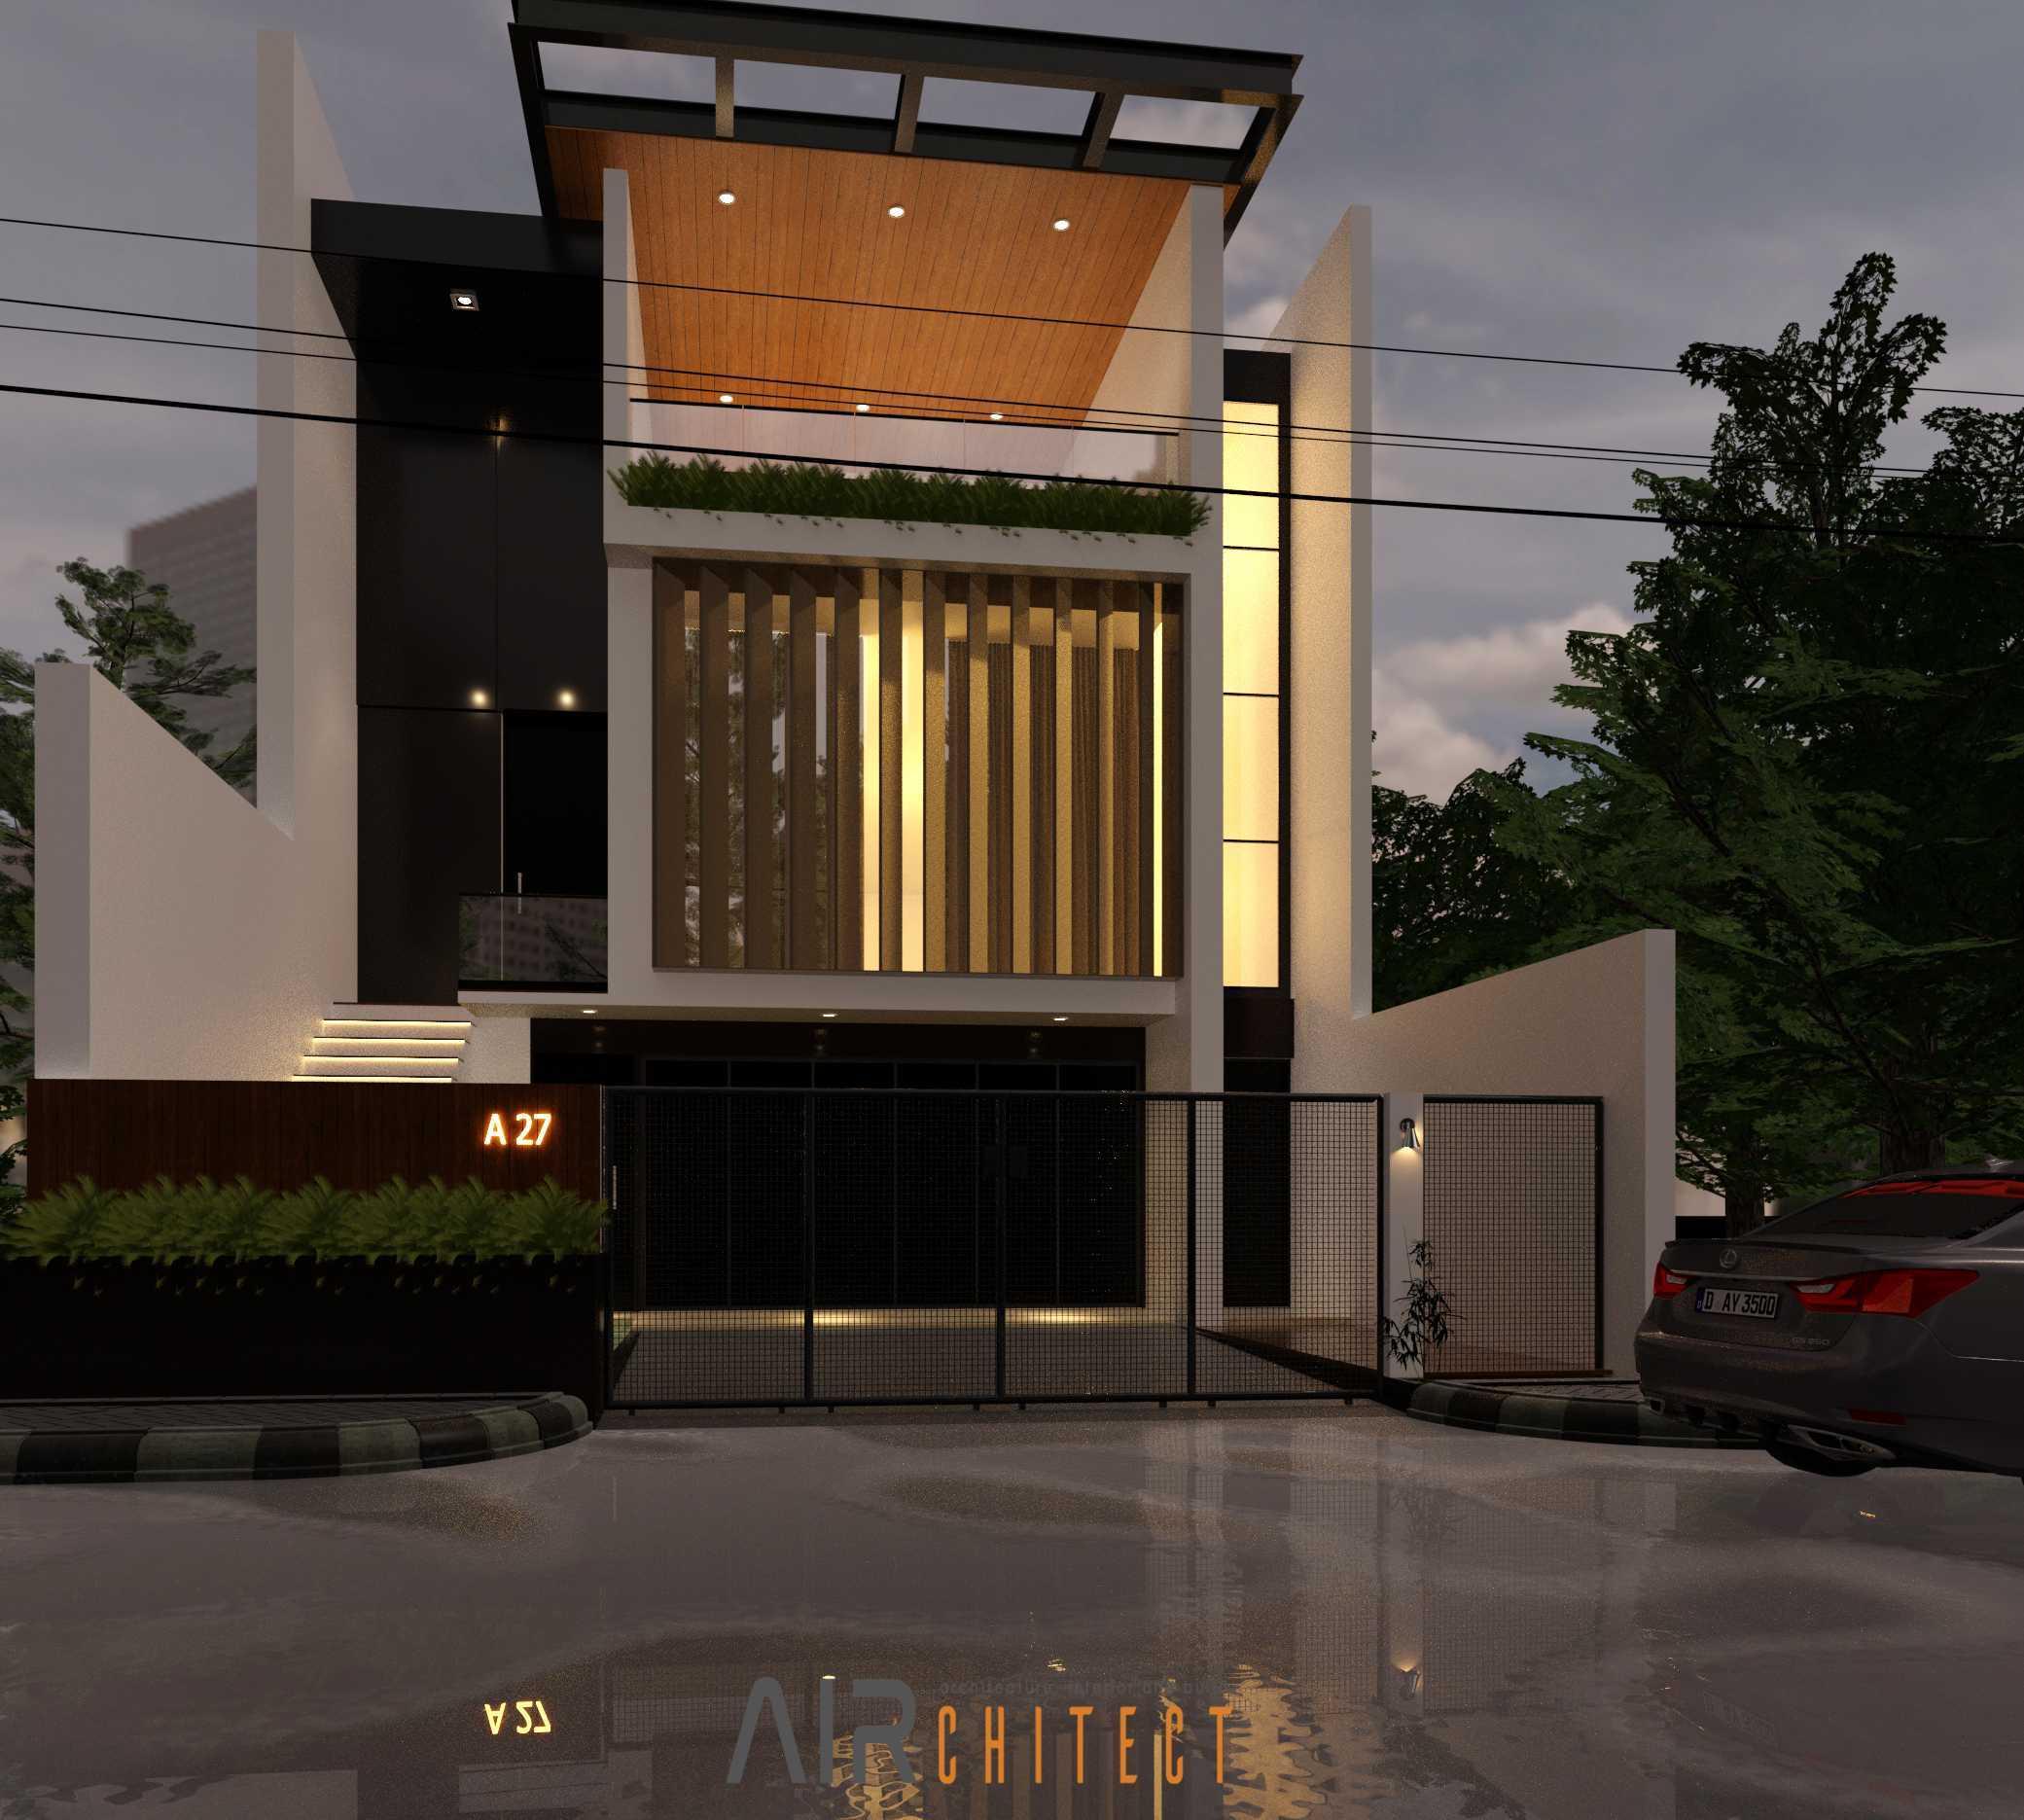 Airchitect Rumah 2 Lantai Jakarta, Daerah Khusus Ibukota Jakarta, Indonesia Jakarta, Daerah Khusus Ibukota Jakarta, Indonesia Airchitect-Rumah-2-Lantai   85106